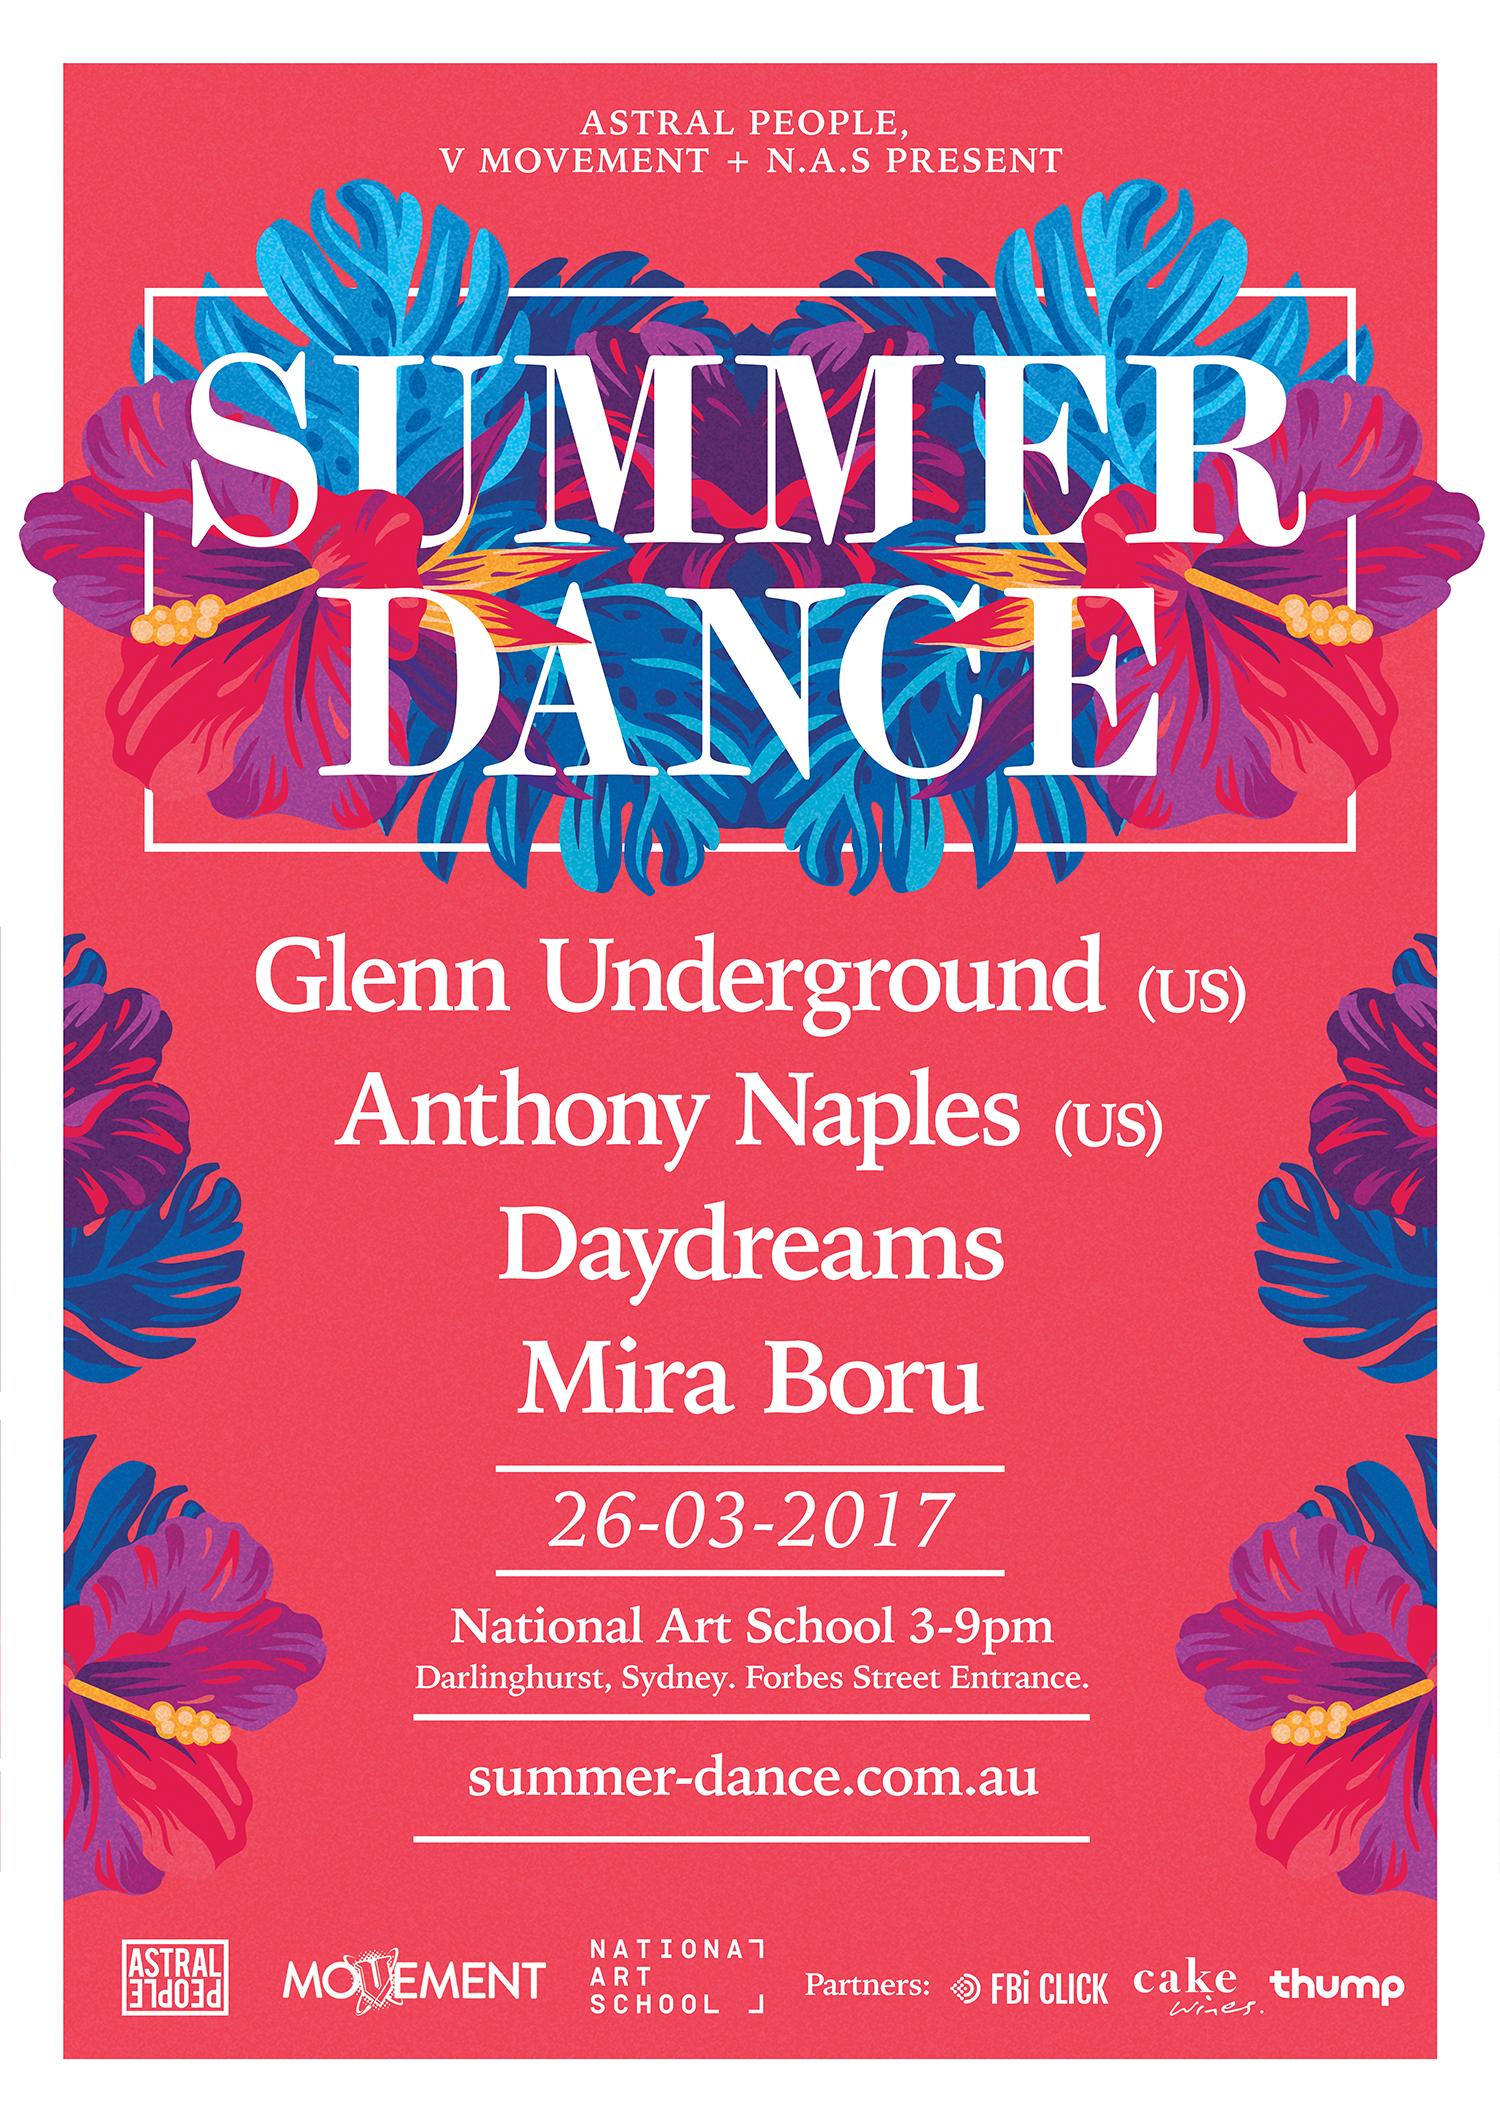 SummerDance_2017 MAR 26- Web Flyer